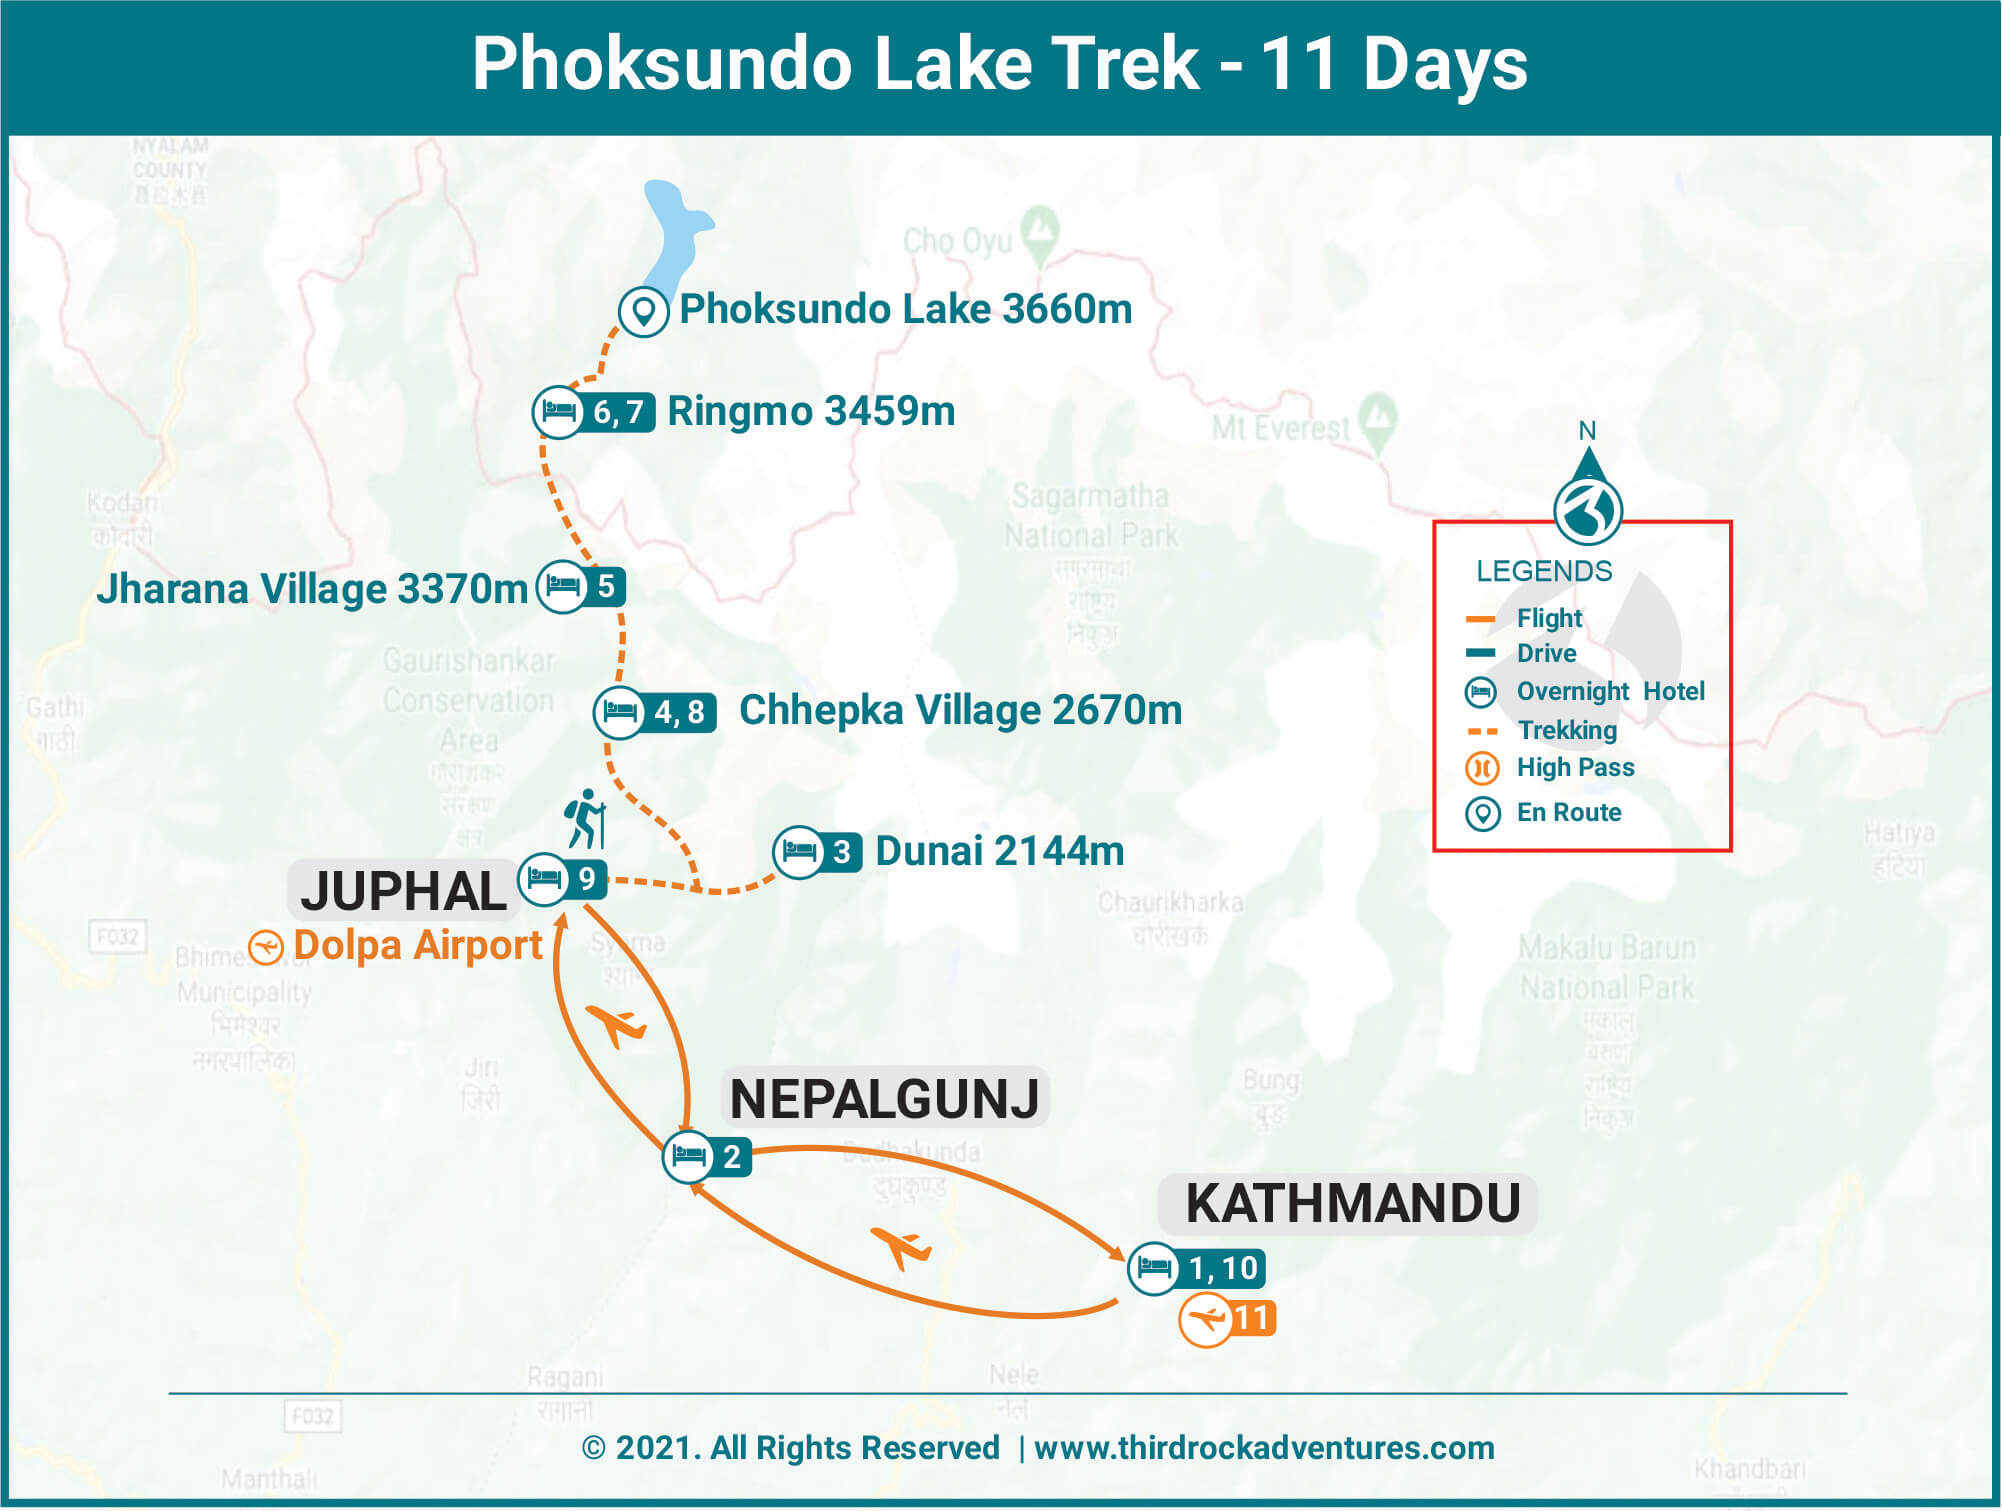 Phoksundo lake trek route map